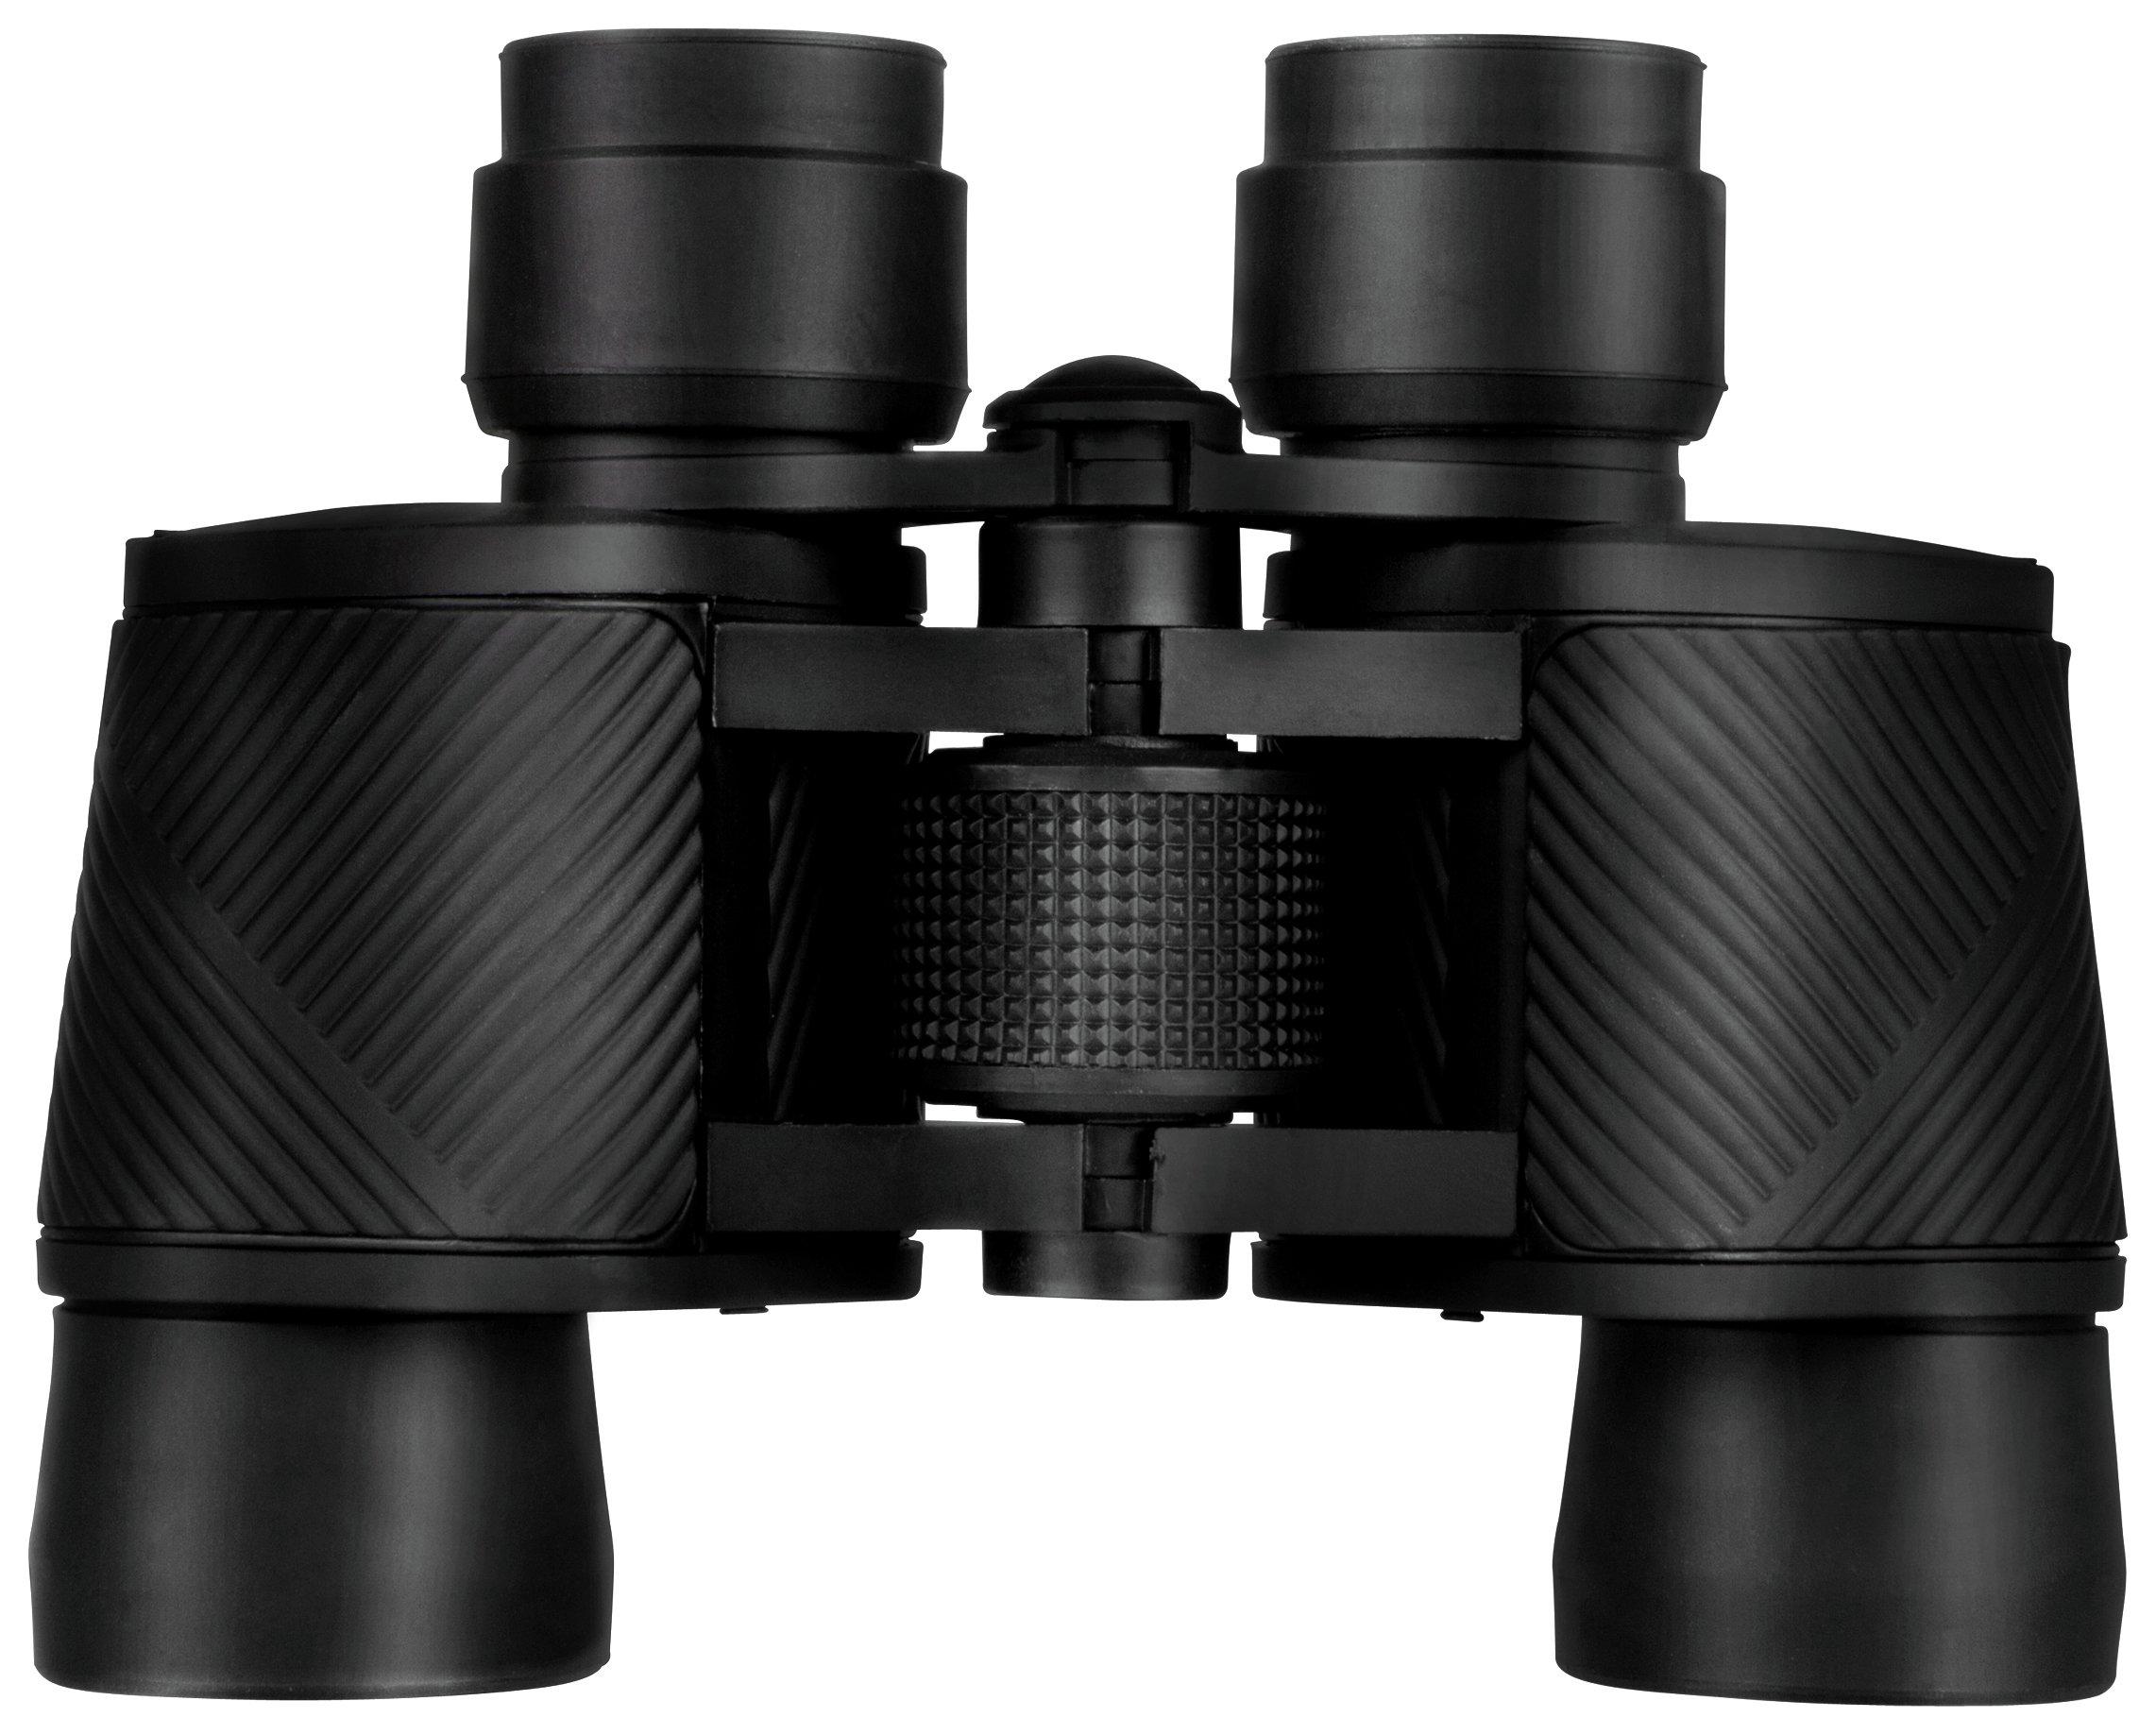 Polaroid IB1050 10 x 50 Porro Prism Binoculars